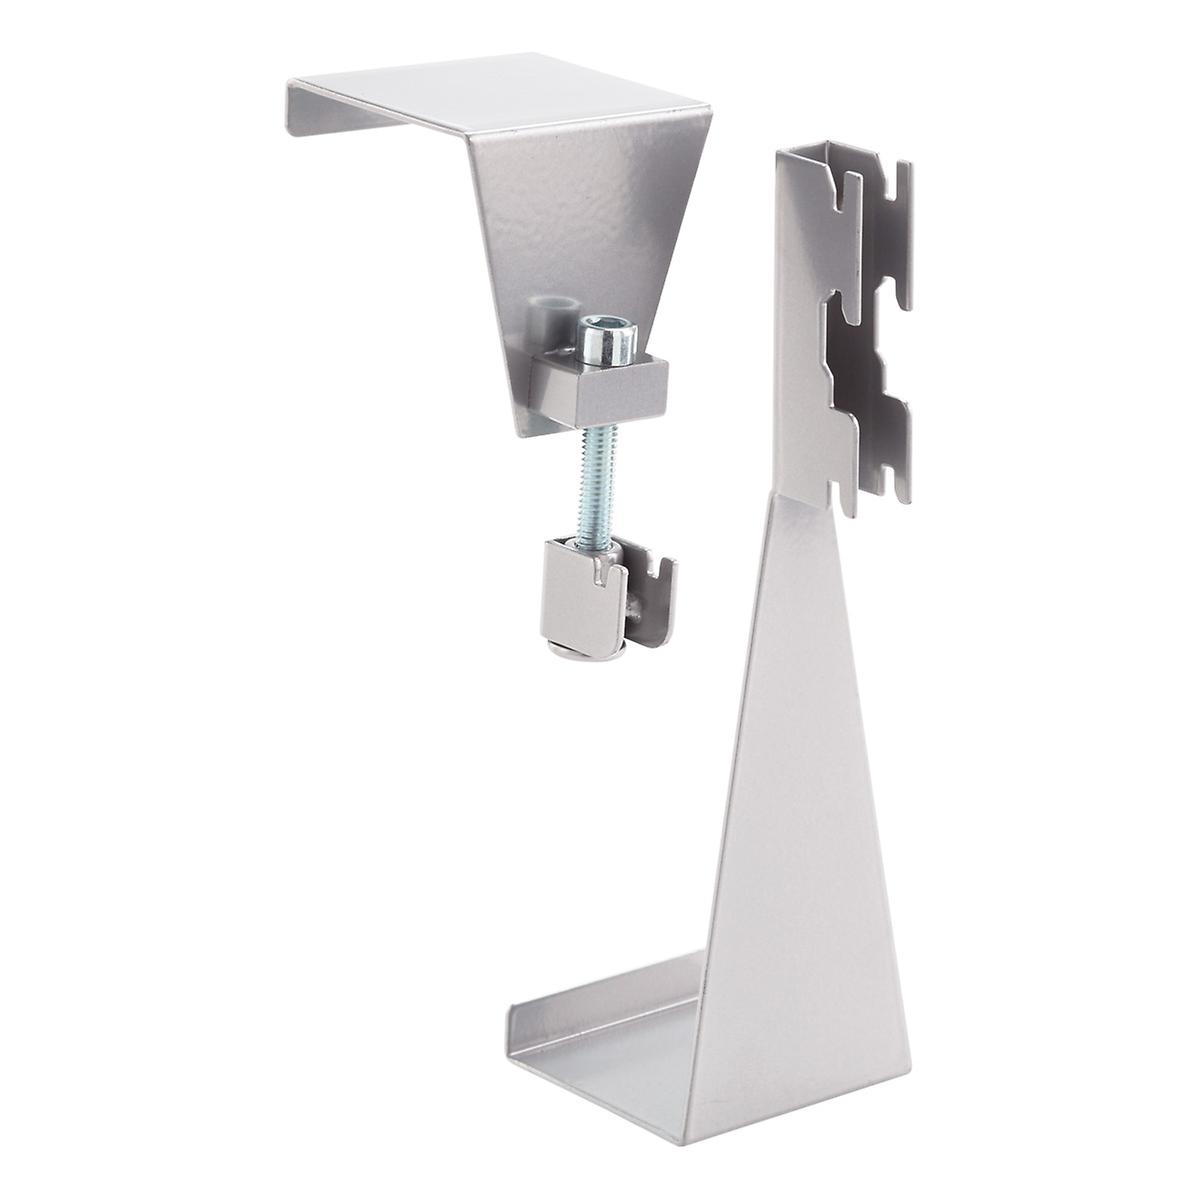 Platinum elfa utility Over the Door Hooks